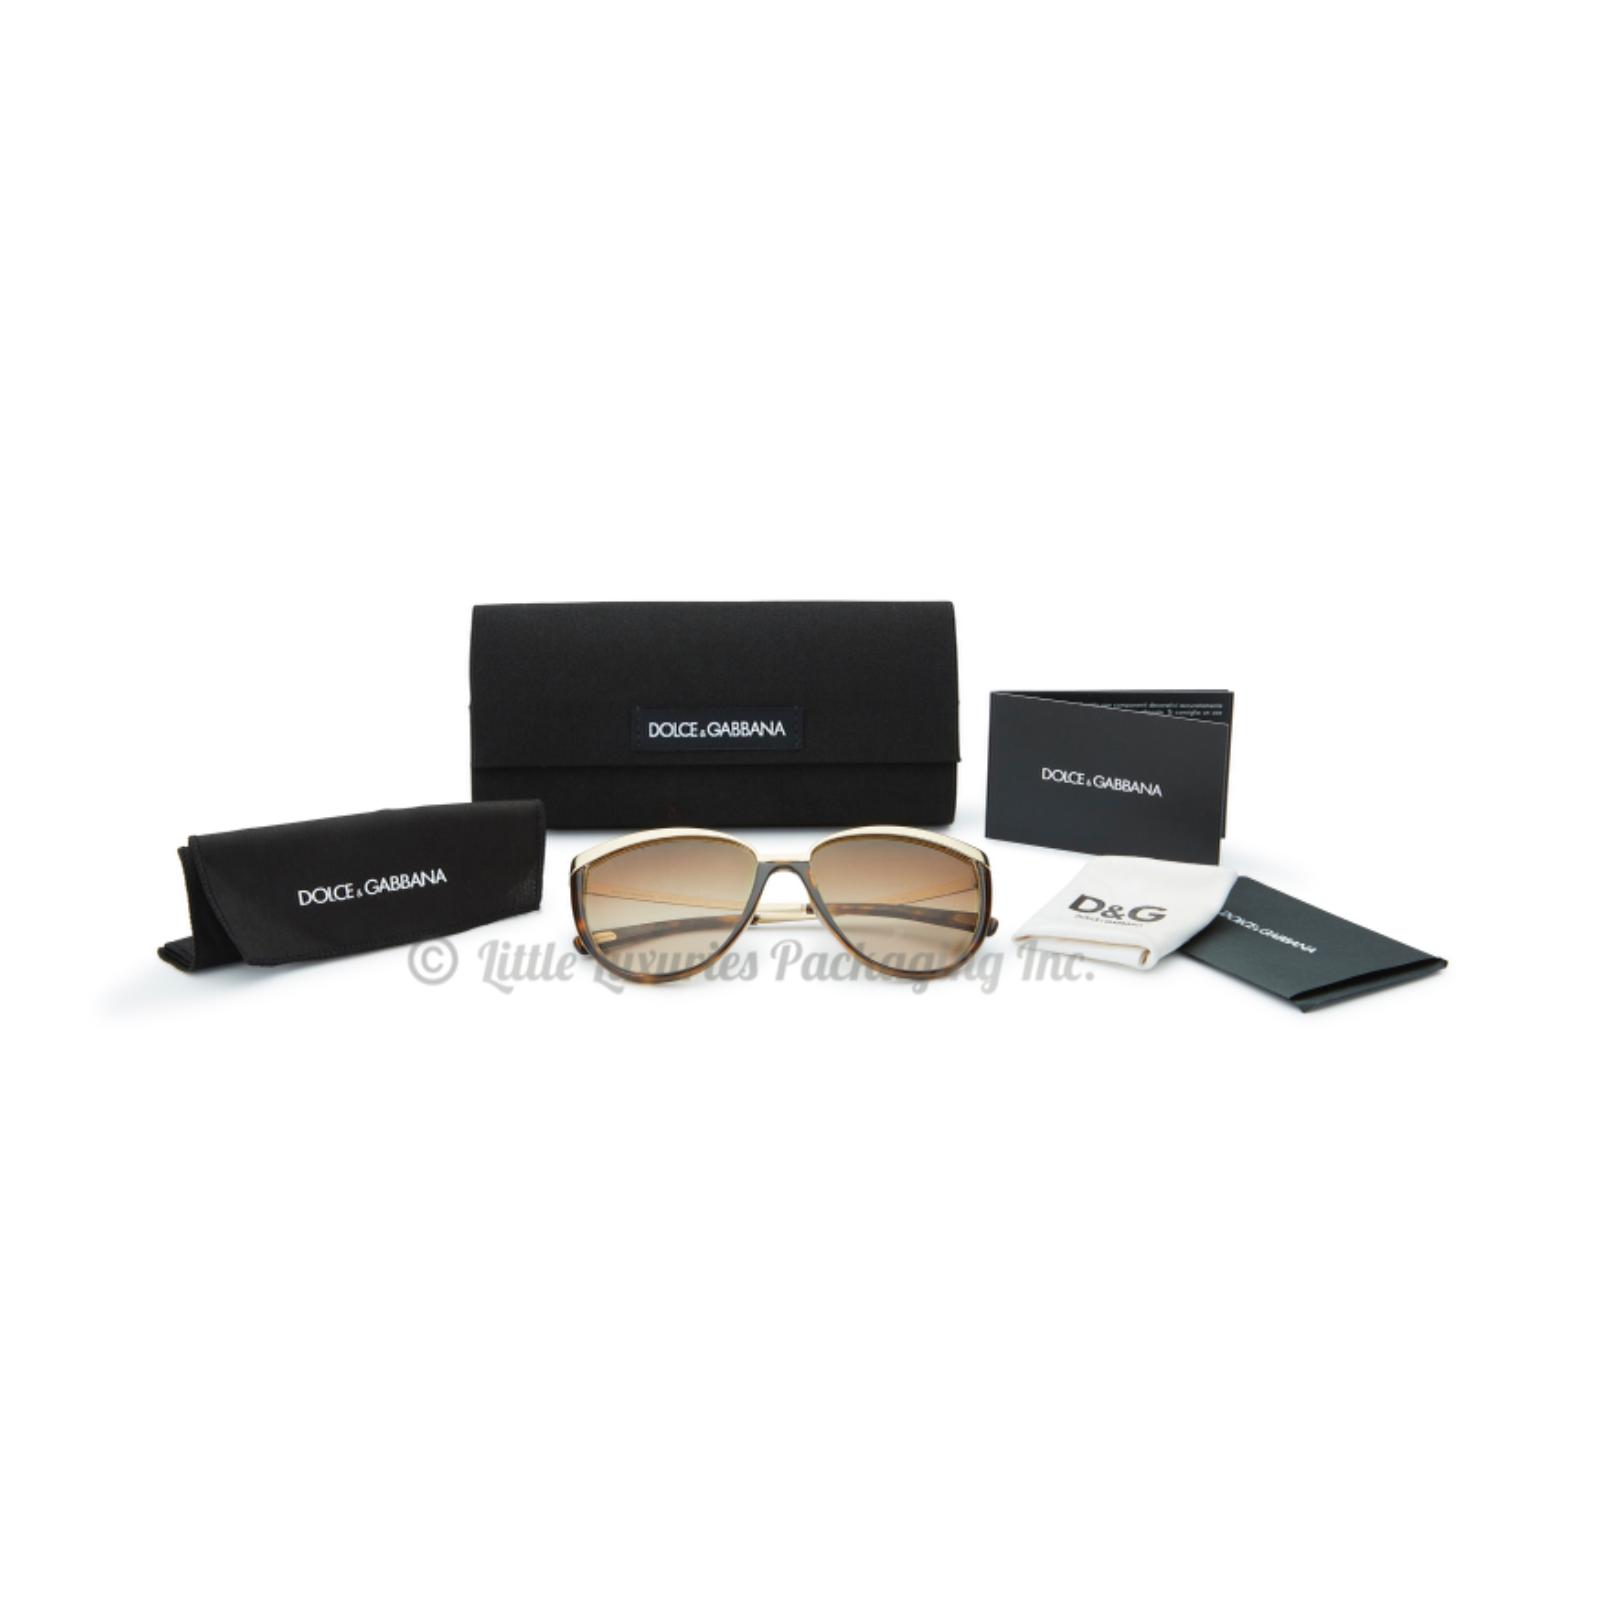 Authentic Dolce & Gabbana D&G Havana Brown Cat Eye Sunglasses + Accessories